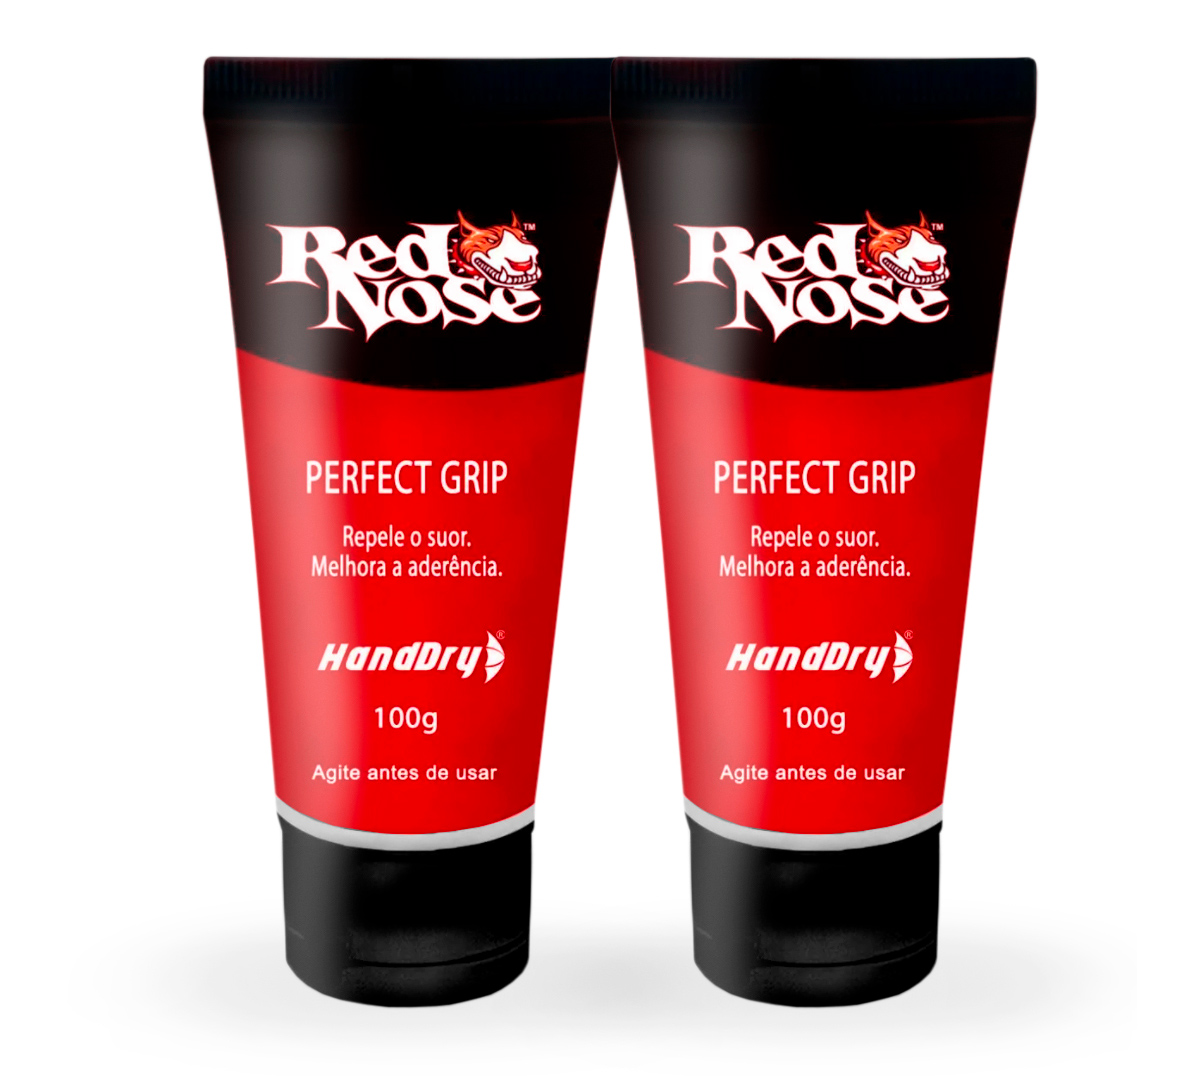 Red Nose Perfect Grip (2 Unids) 100g - Handdry  - Crossfit, Parkour, BMX